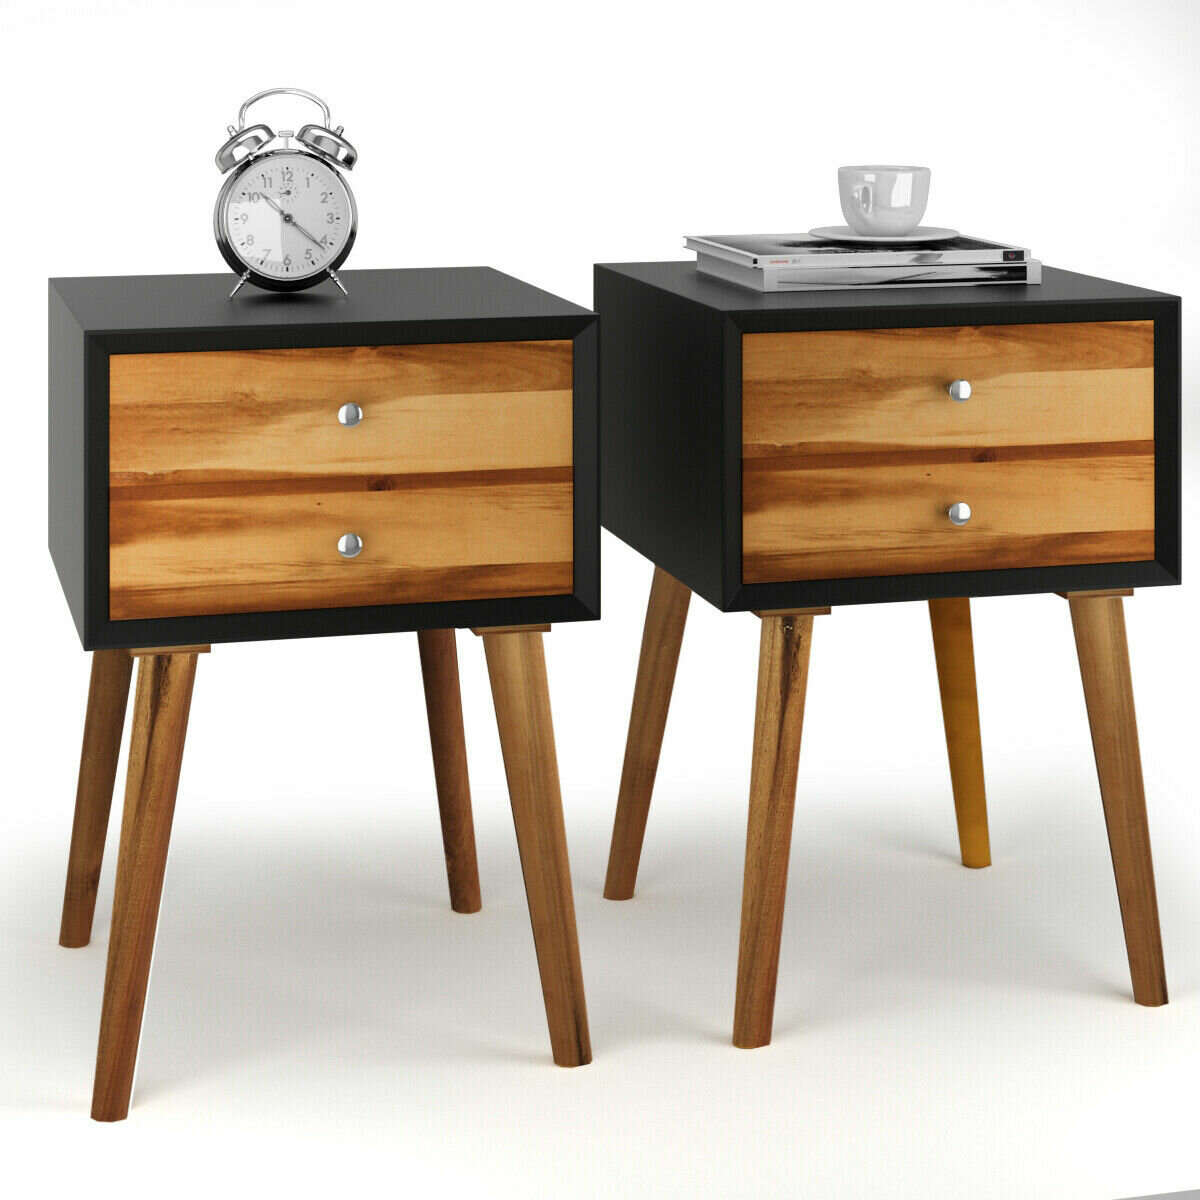 Furniture Mid Century Scandi Danish Design Solid Wood Bedside Table 1 Drawer Open Shelf Home Furniture Diy Cruzeirista Com Br